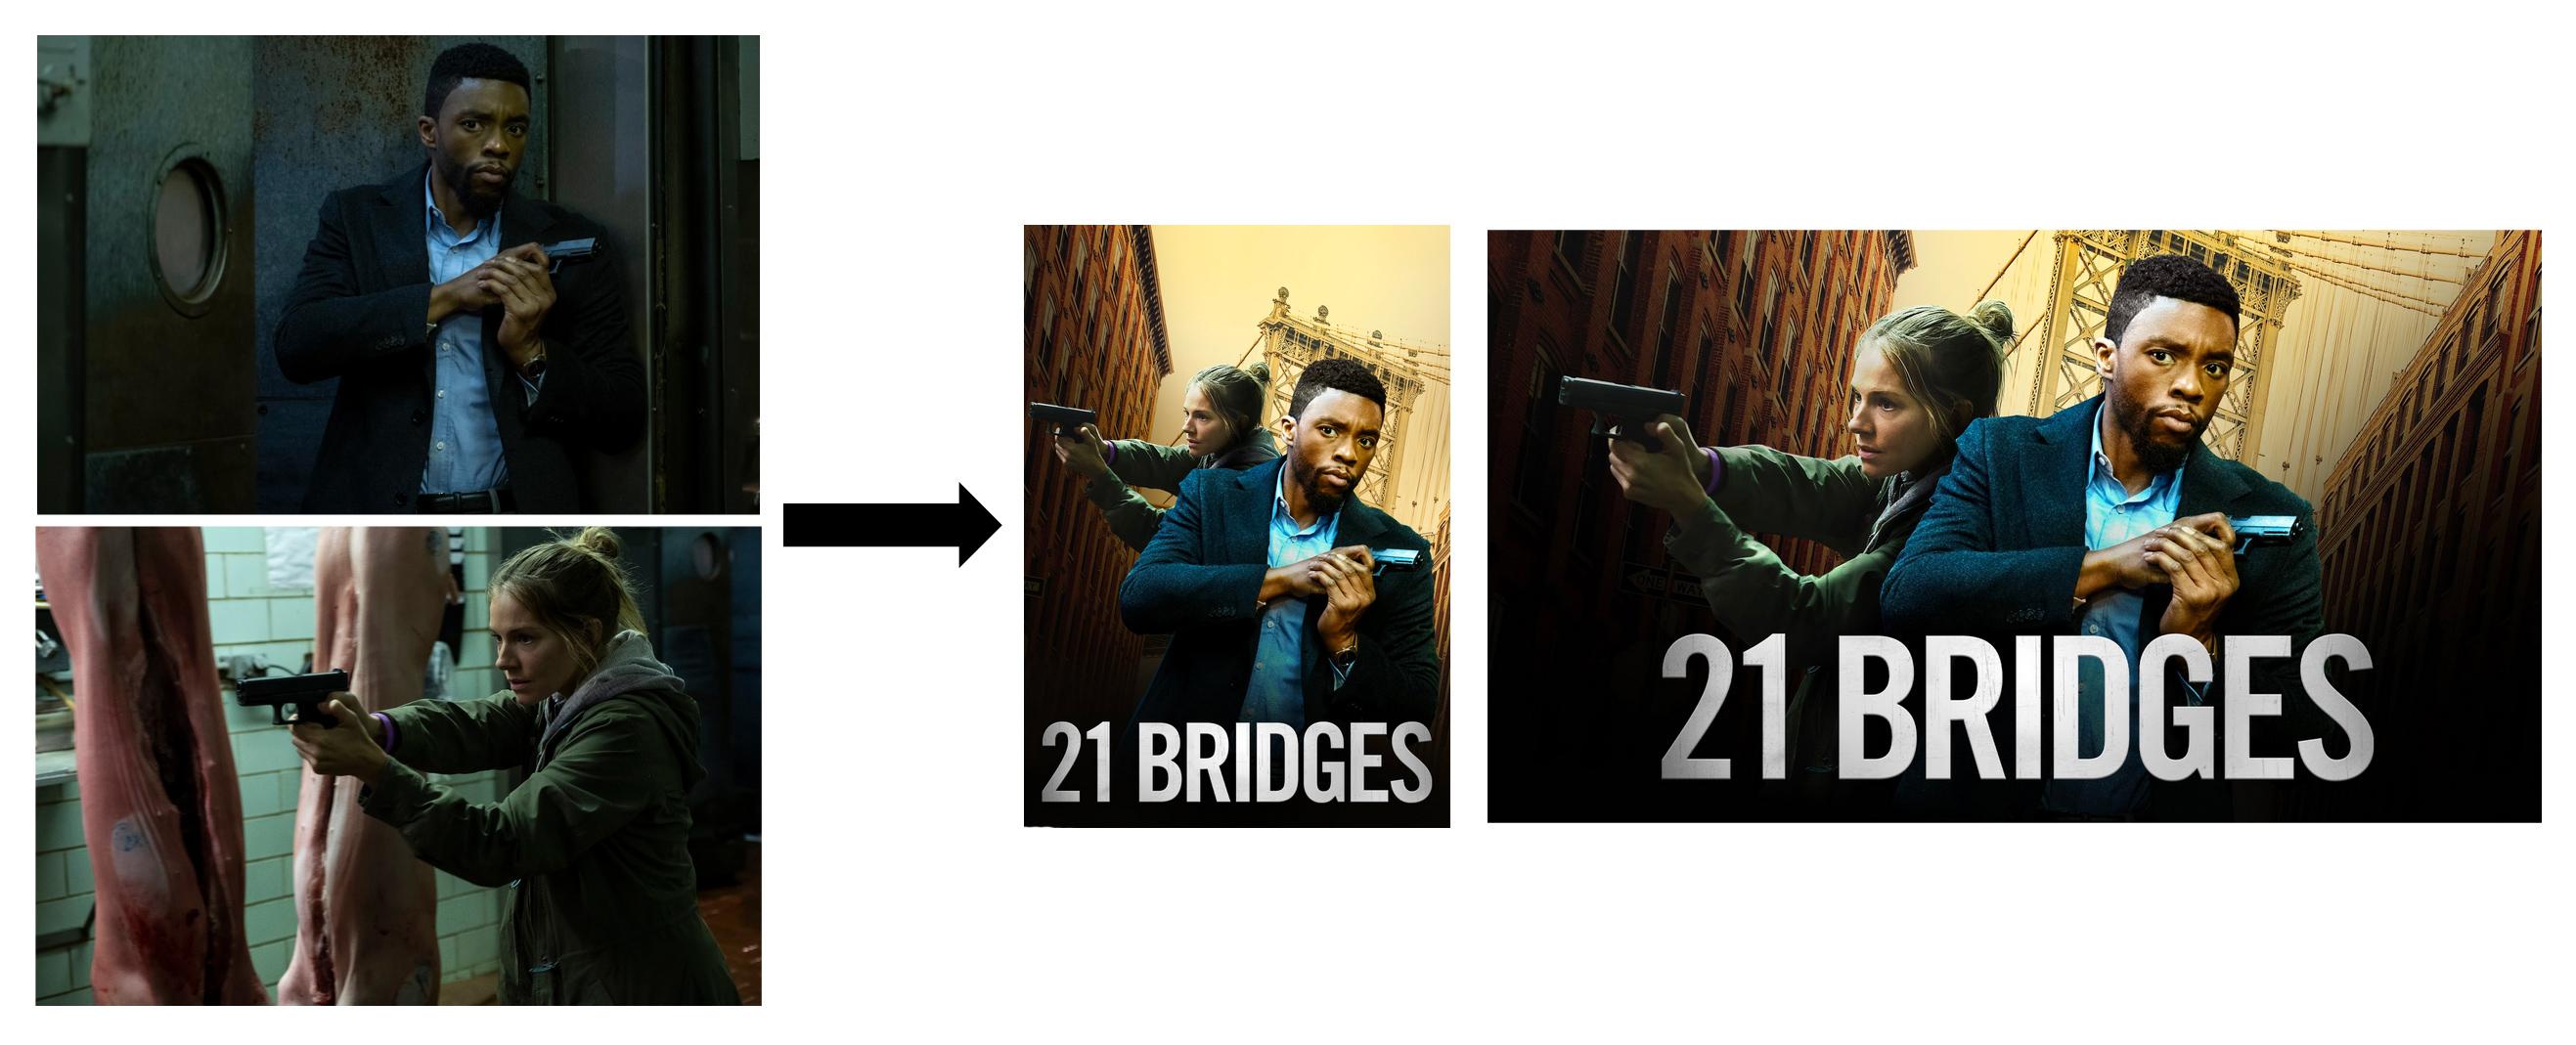 21 Bridges Stills from Content → SDP & Boxshot